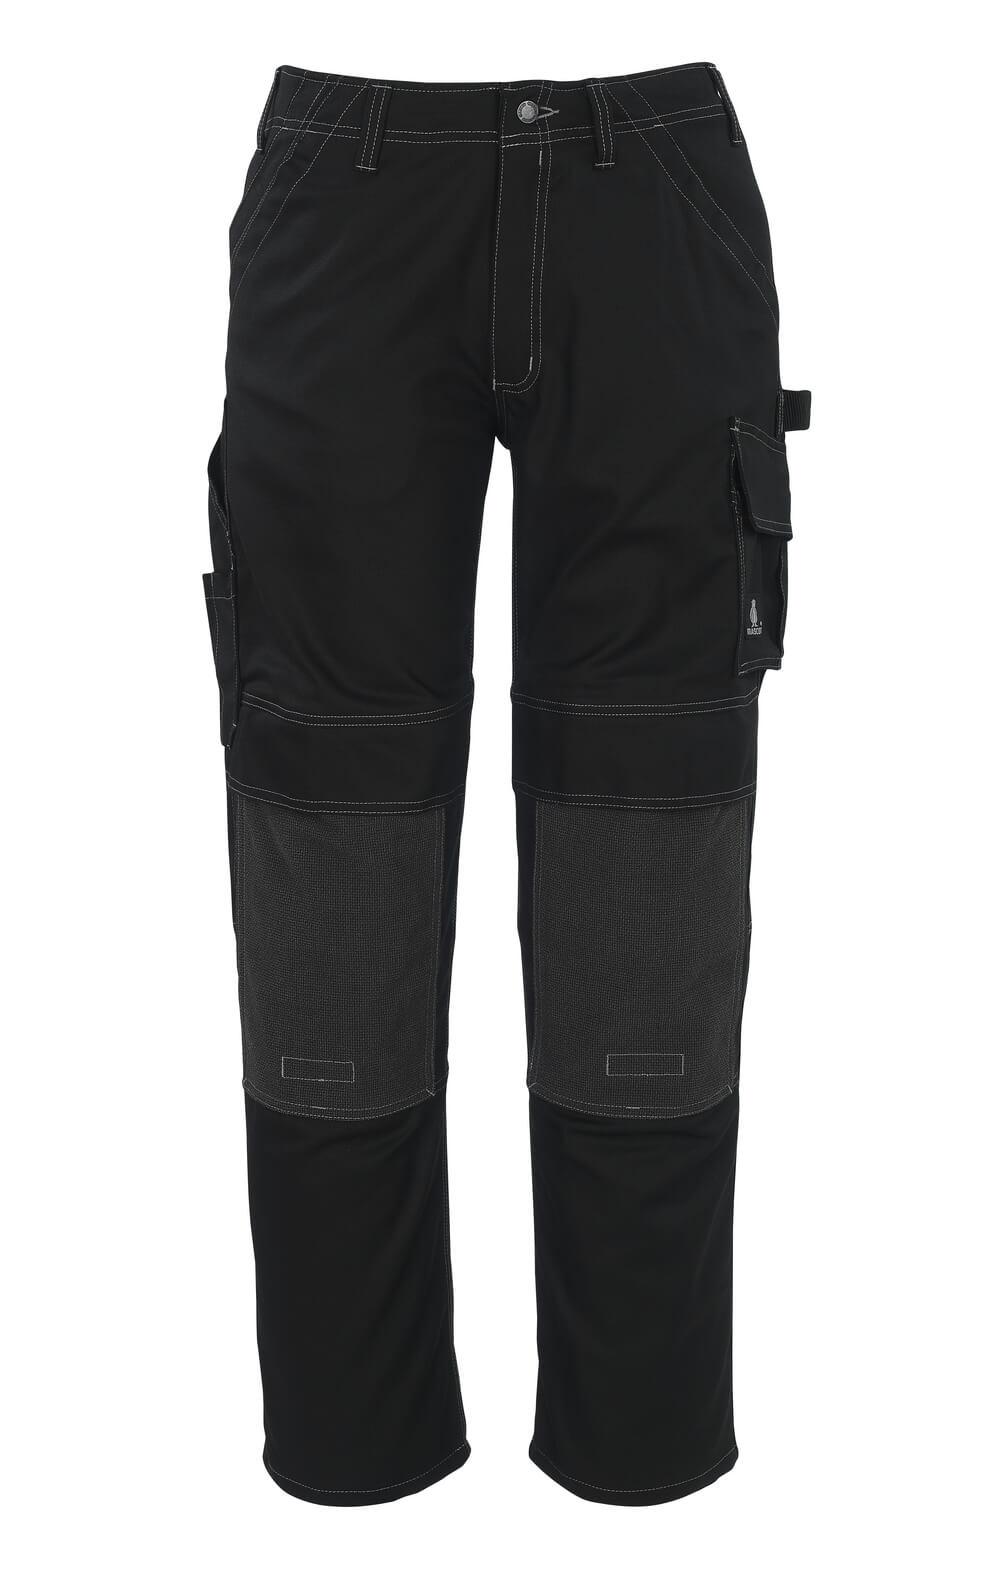 05079-010-09 Pantalon avec poches genouillères - Noir